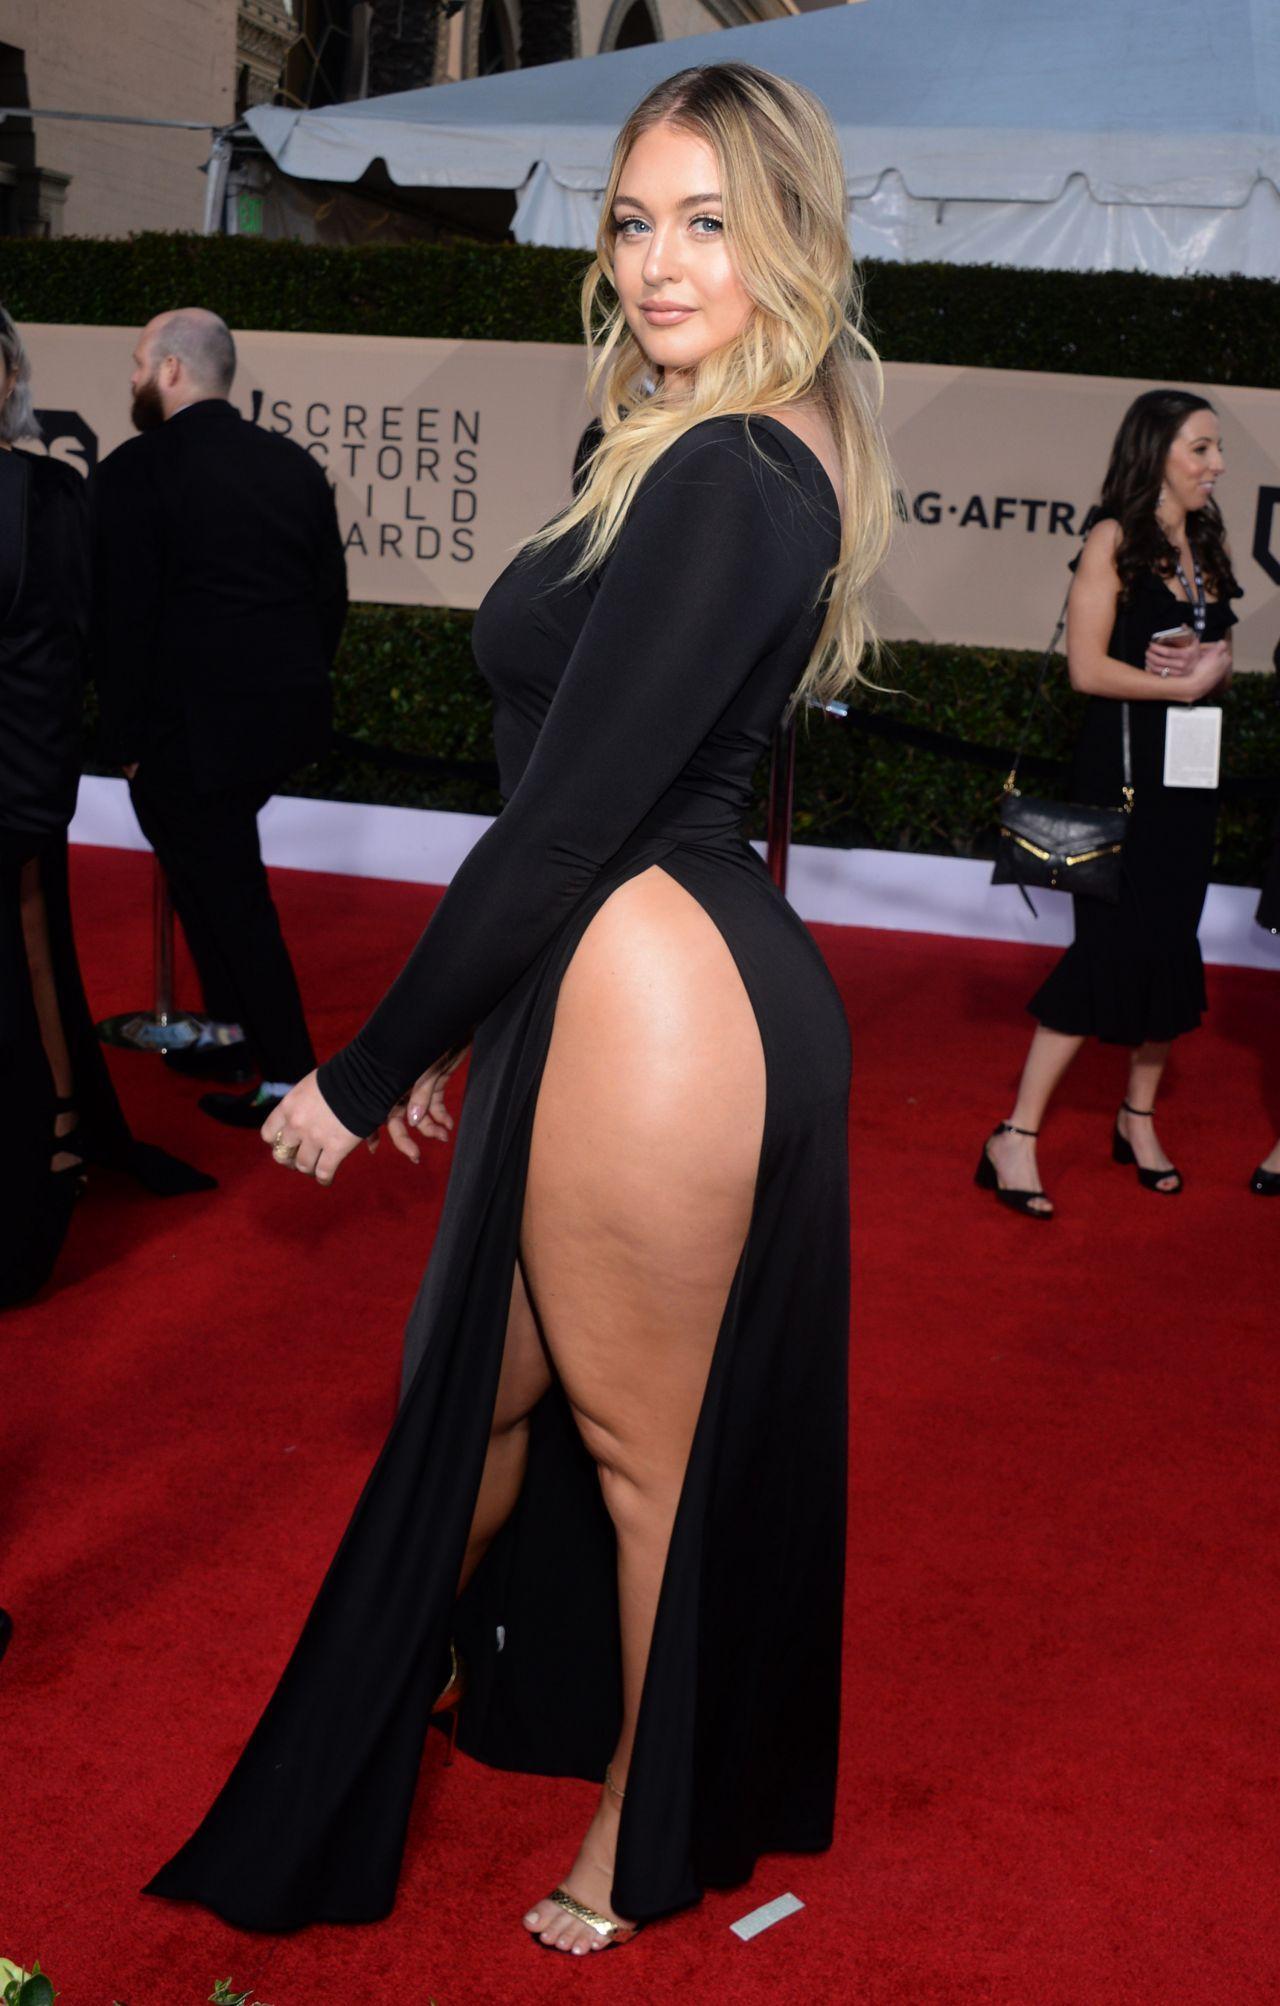 nudes (14 photos), Bikini Celebrity foto